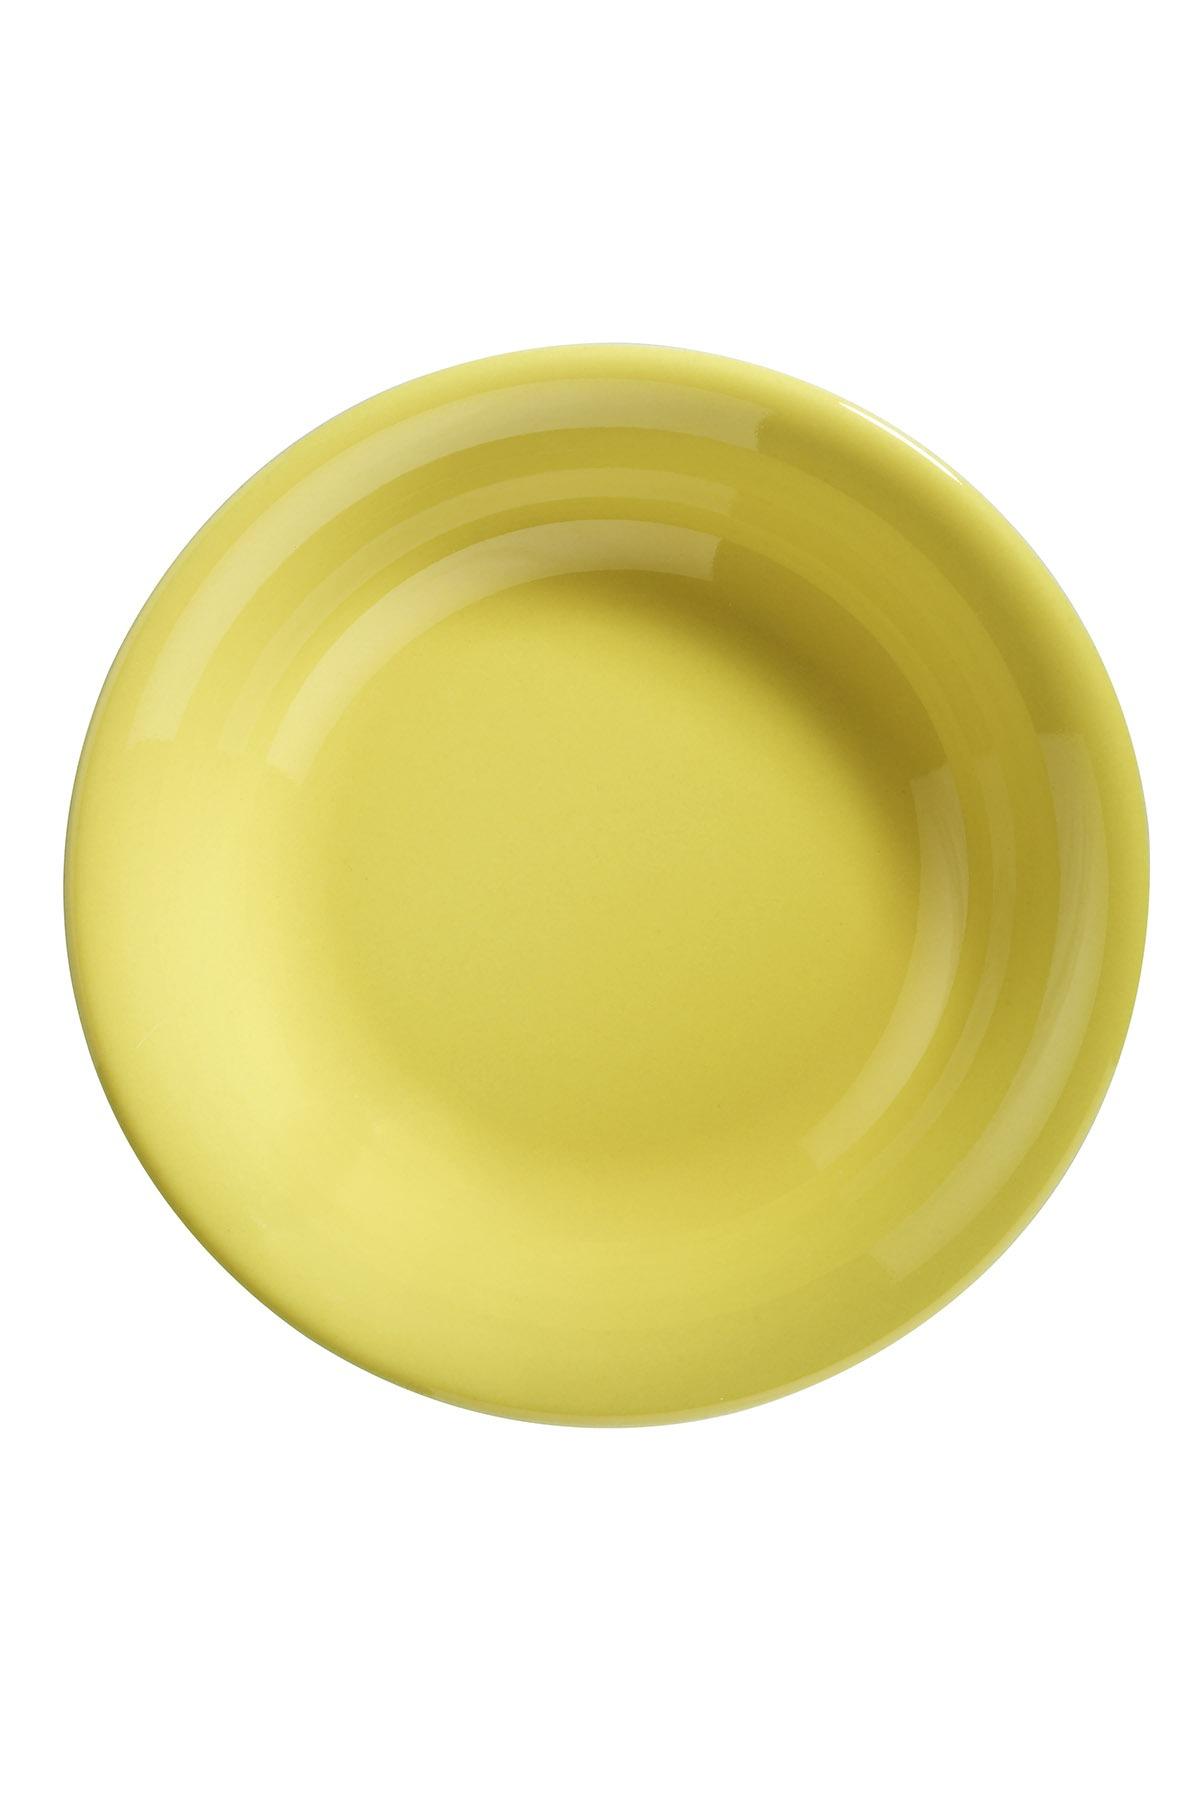 Kütahya Porselen Nanoceram 24 Parça Yemek Seti 880152